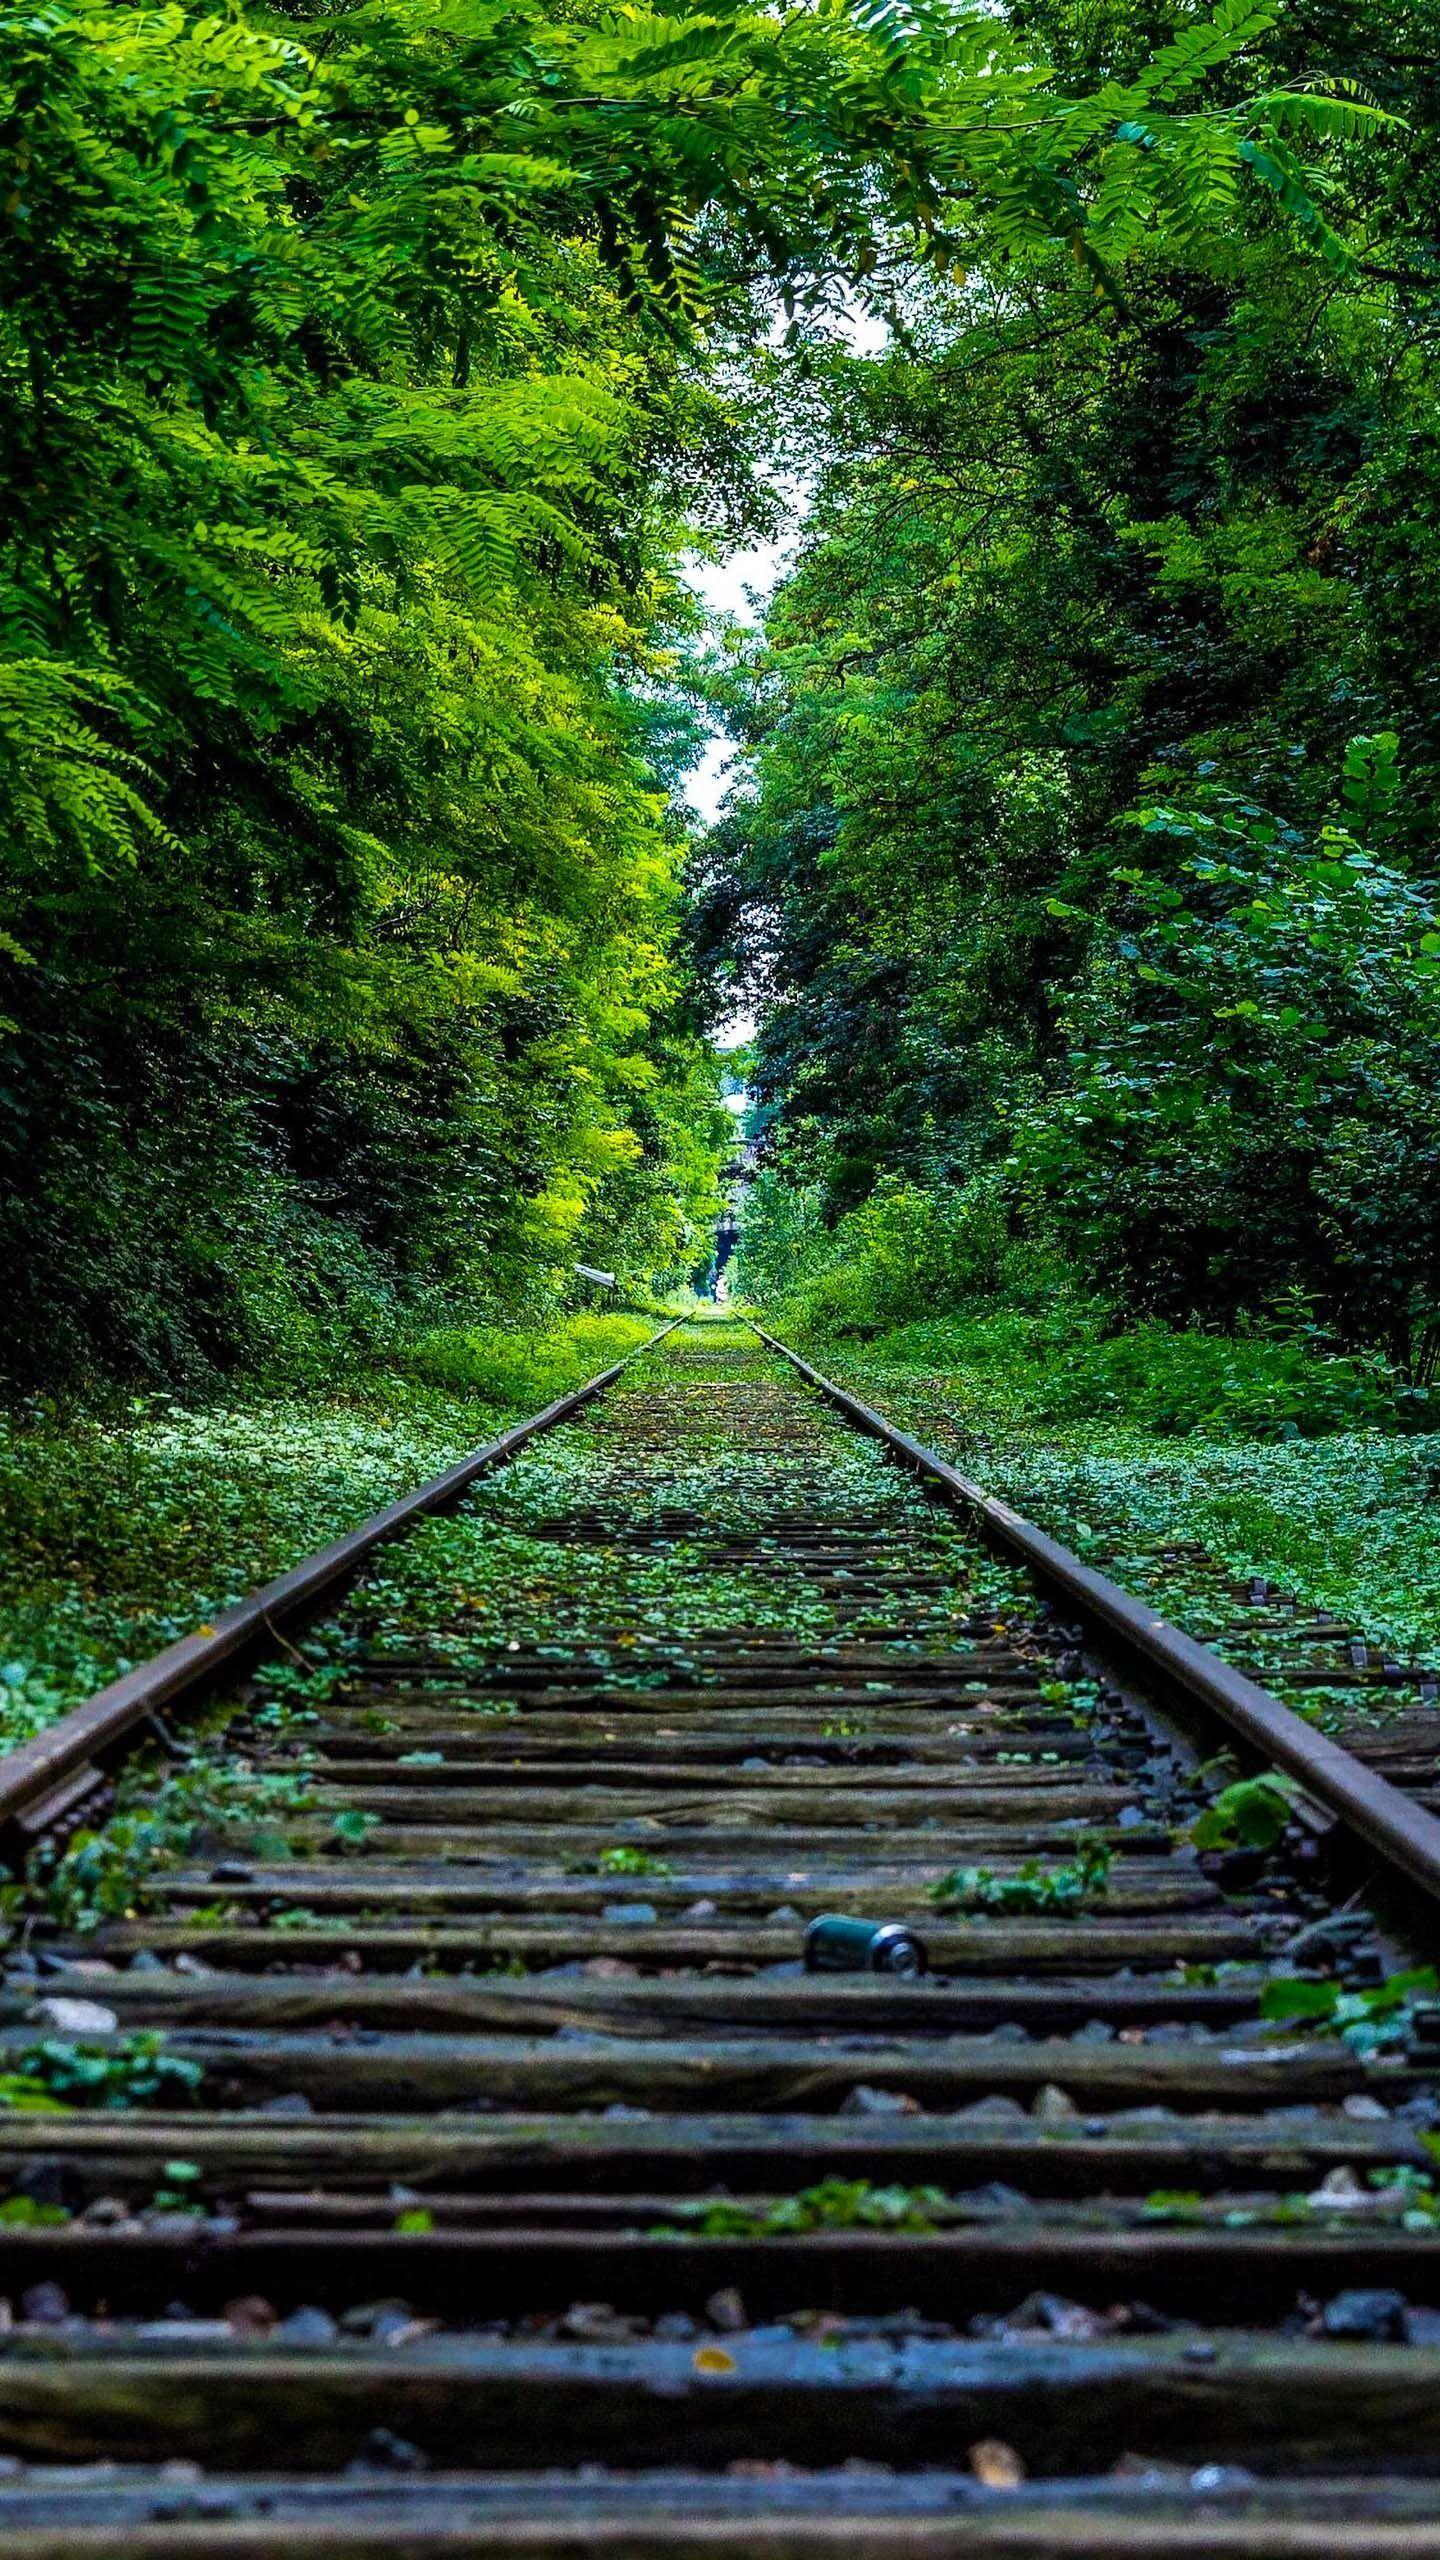 Train Tracks 4K Mobile Wallpapers - Top